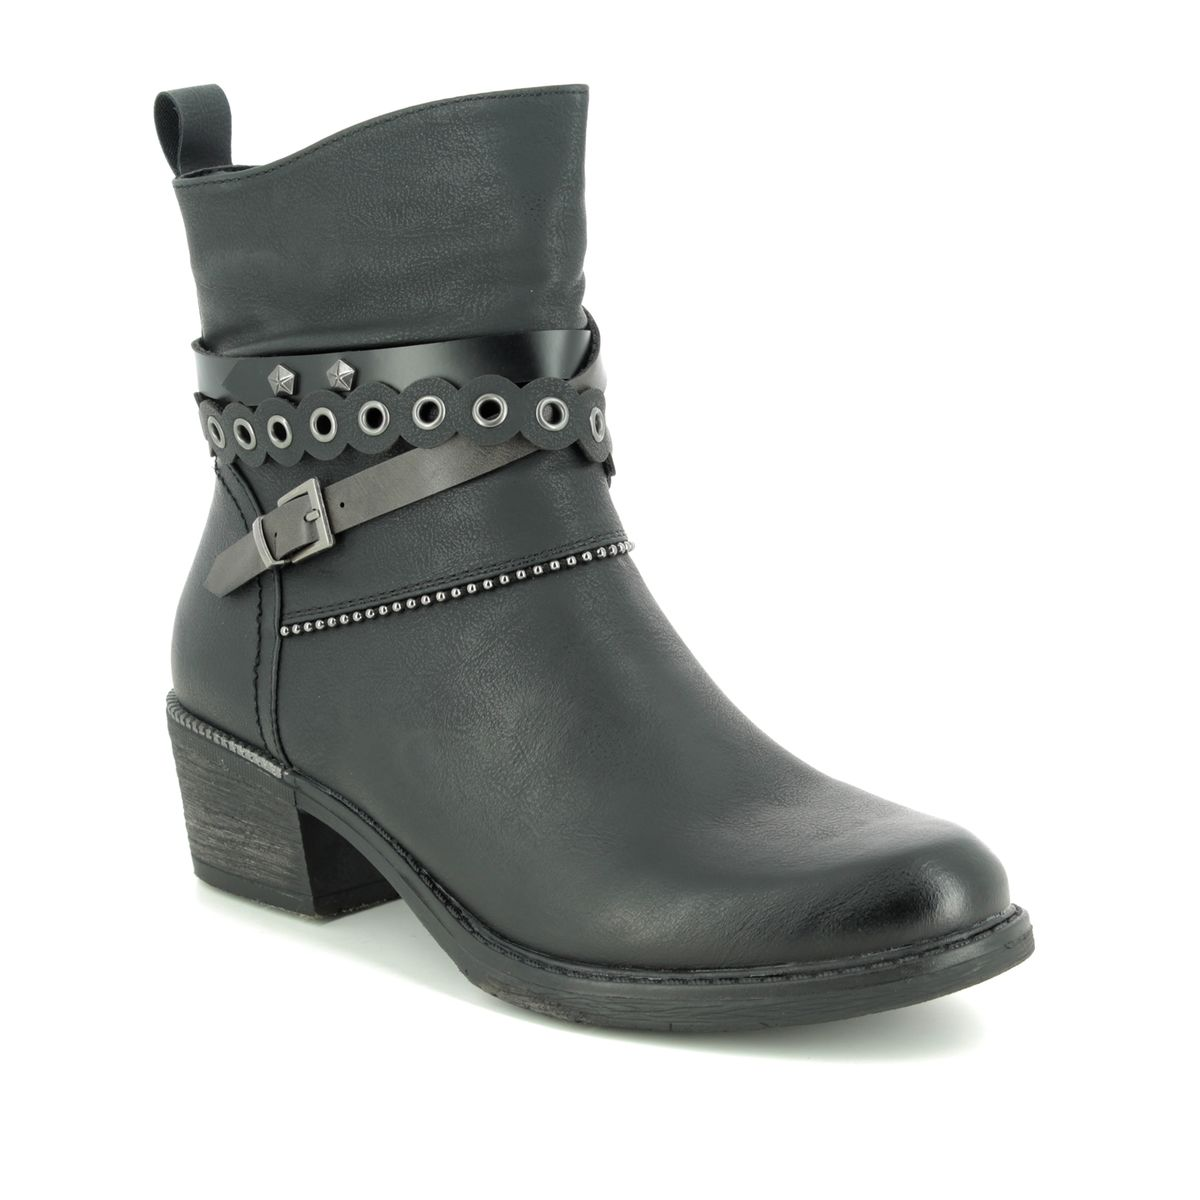 Remonte Bernonte R1171-01 Black ankle boots